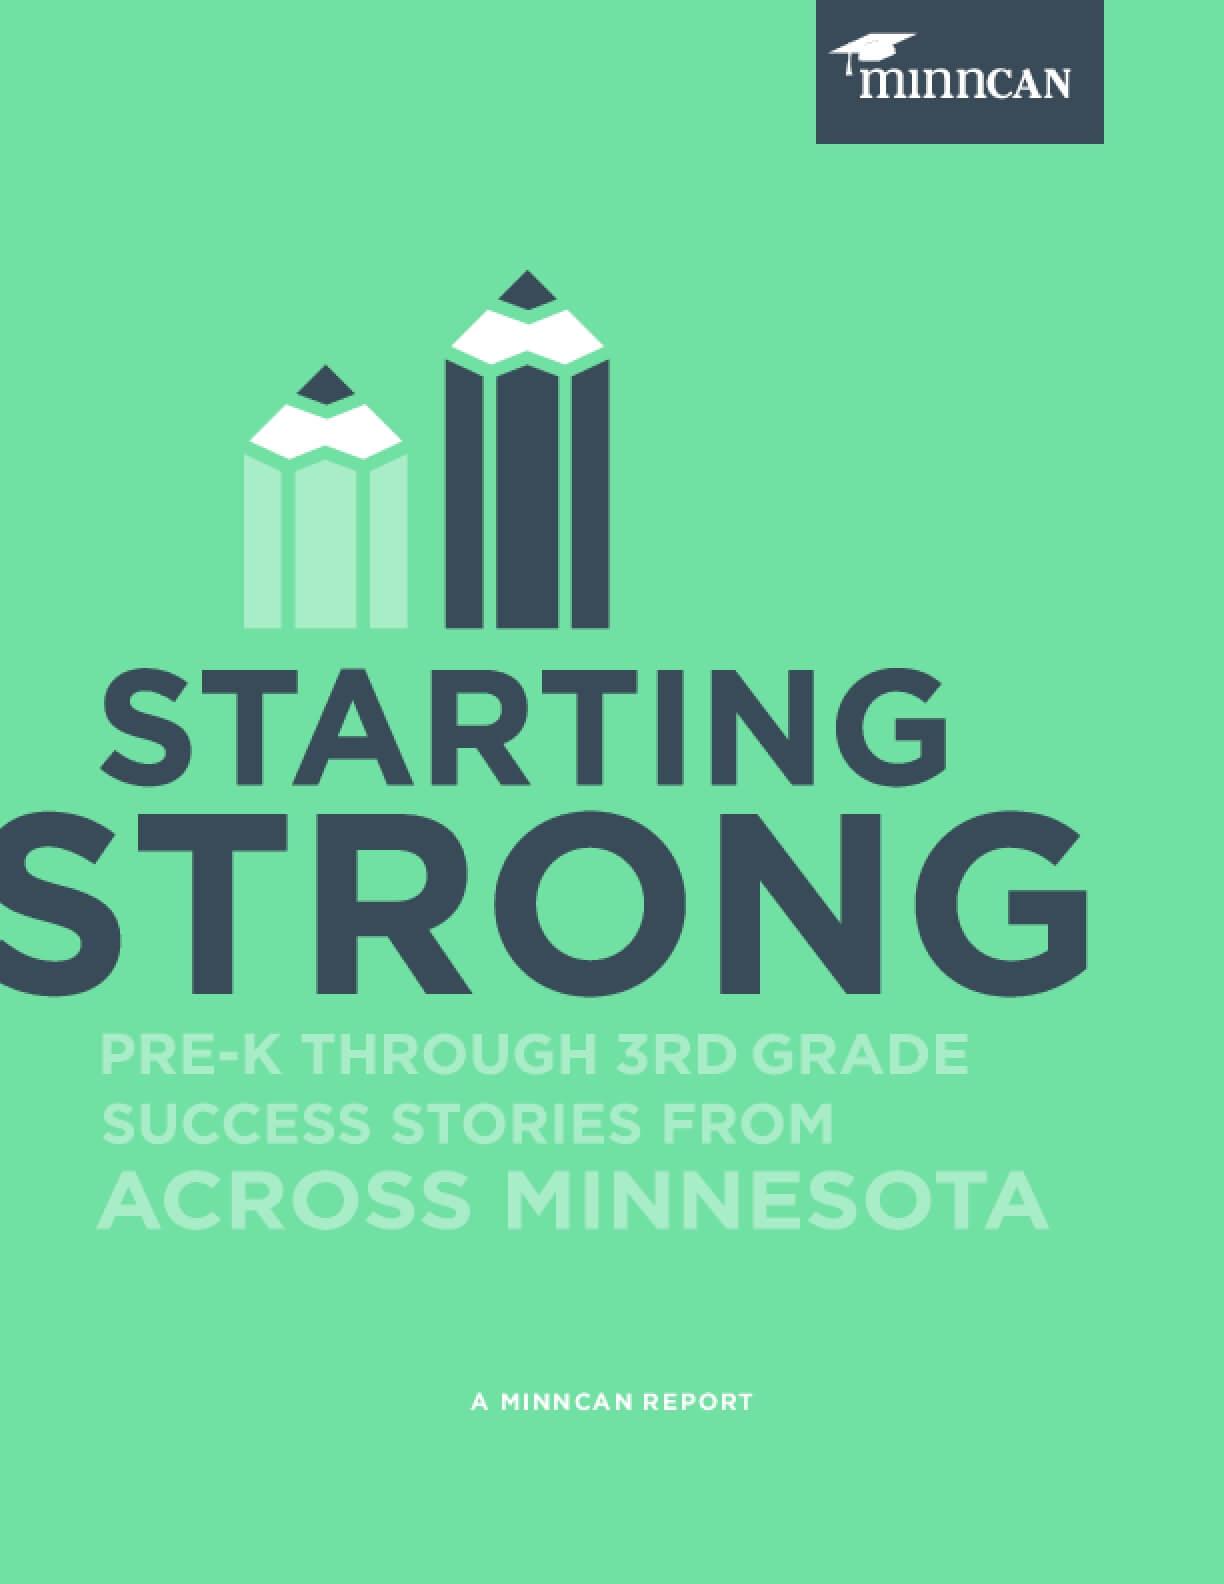 Starting Strong: Pre-K through 3rd Grade Success Stories from Across Minnesota